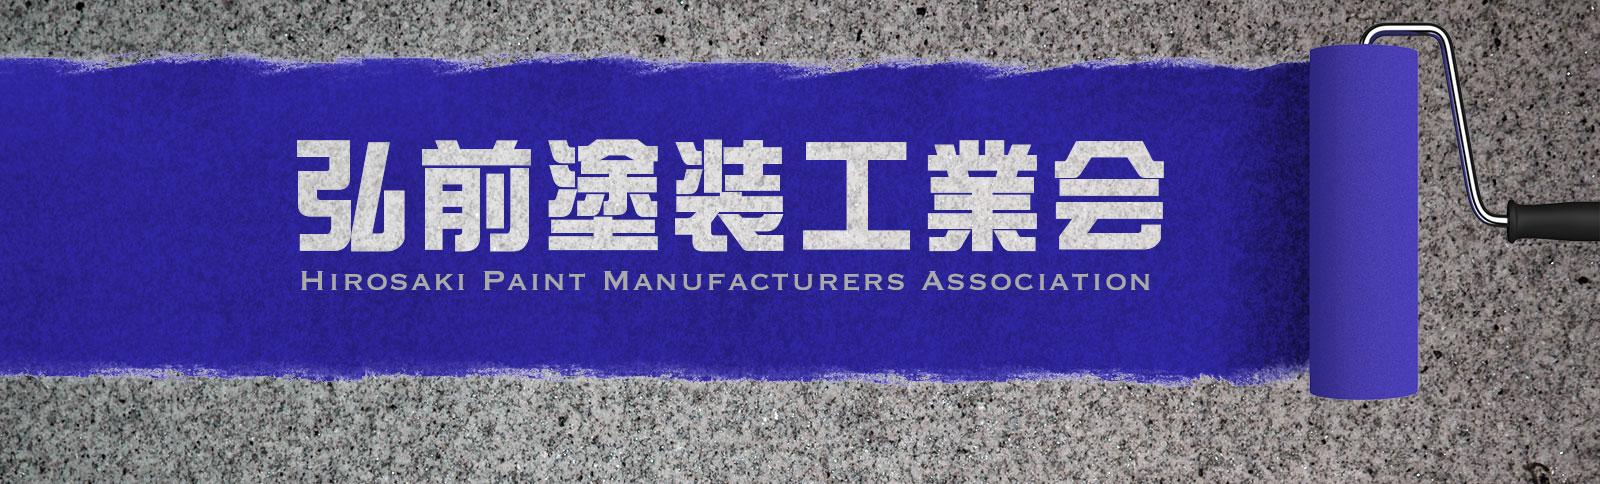 弘前塗装工業会イメージ